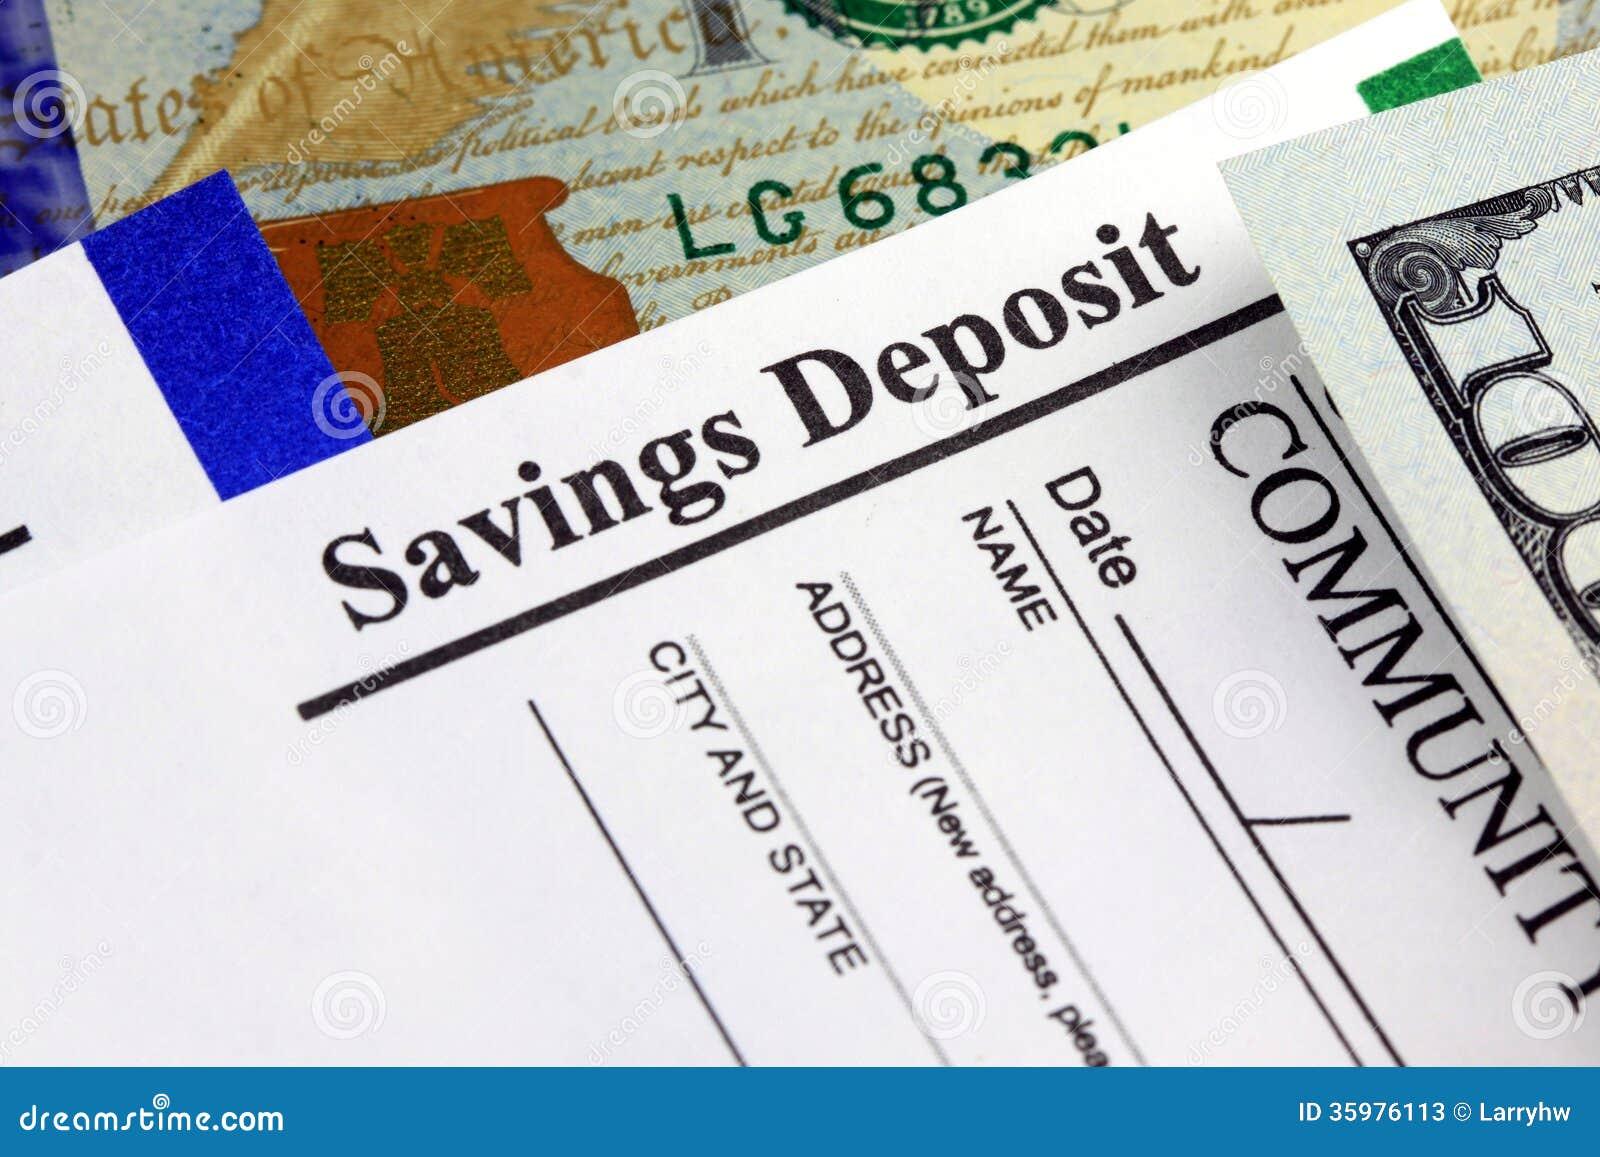 Nota de ingreso de ahorros - concepto de las actividades bancarias